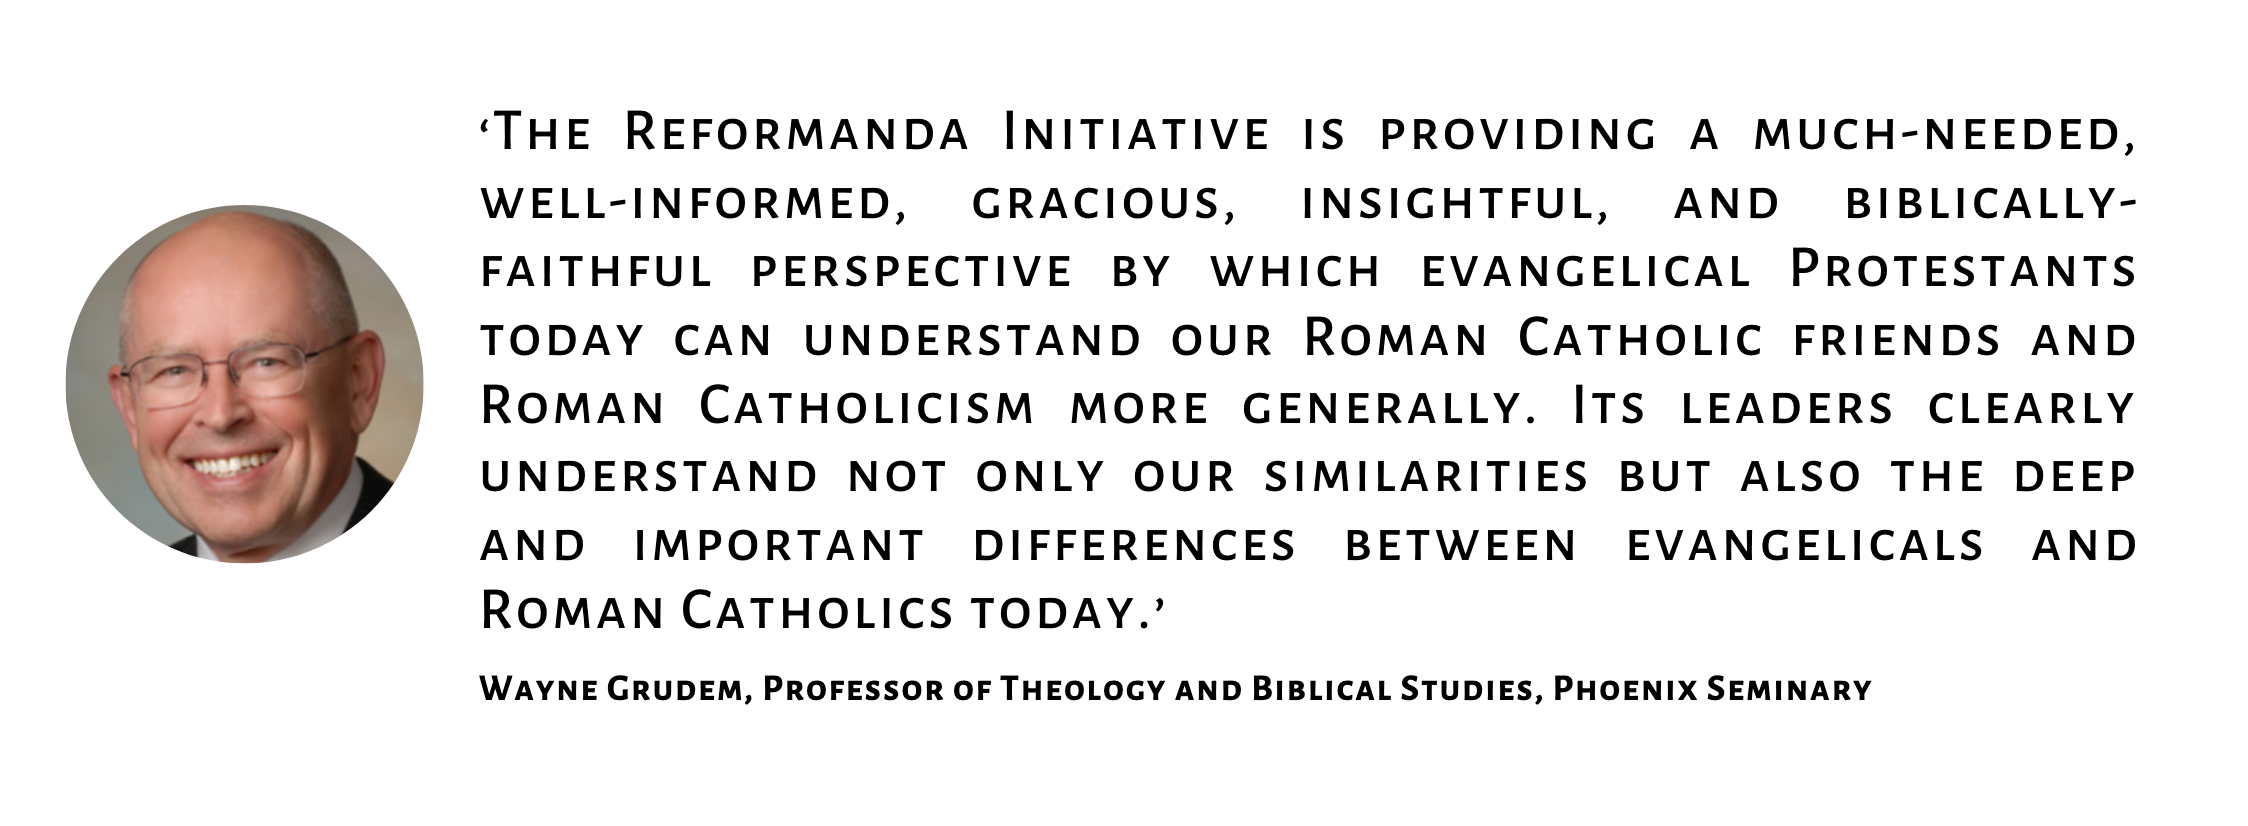 Wayne Grudem (Professor of Theology and Biblical Studies, Phoenix Seminary)